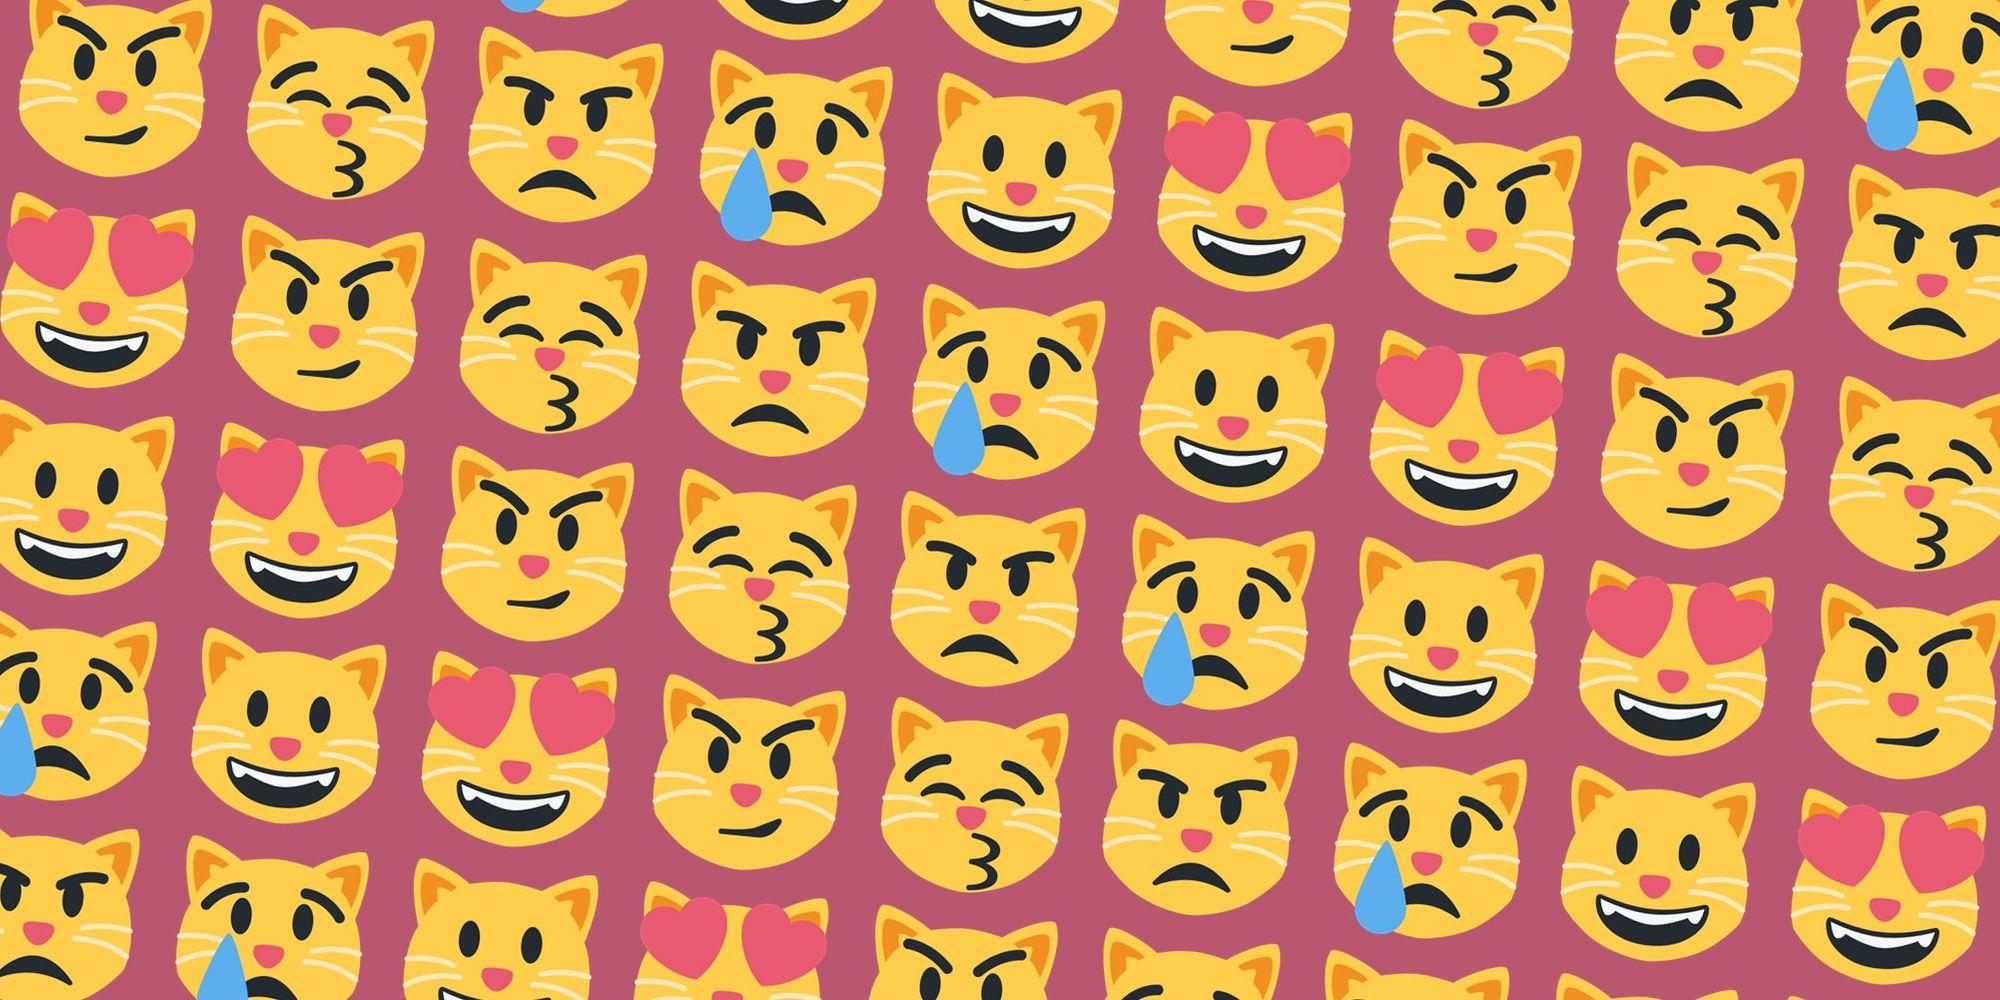 Twemoji 11.3 Emoji Changelog